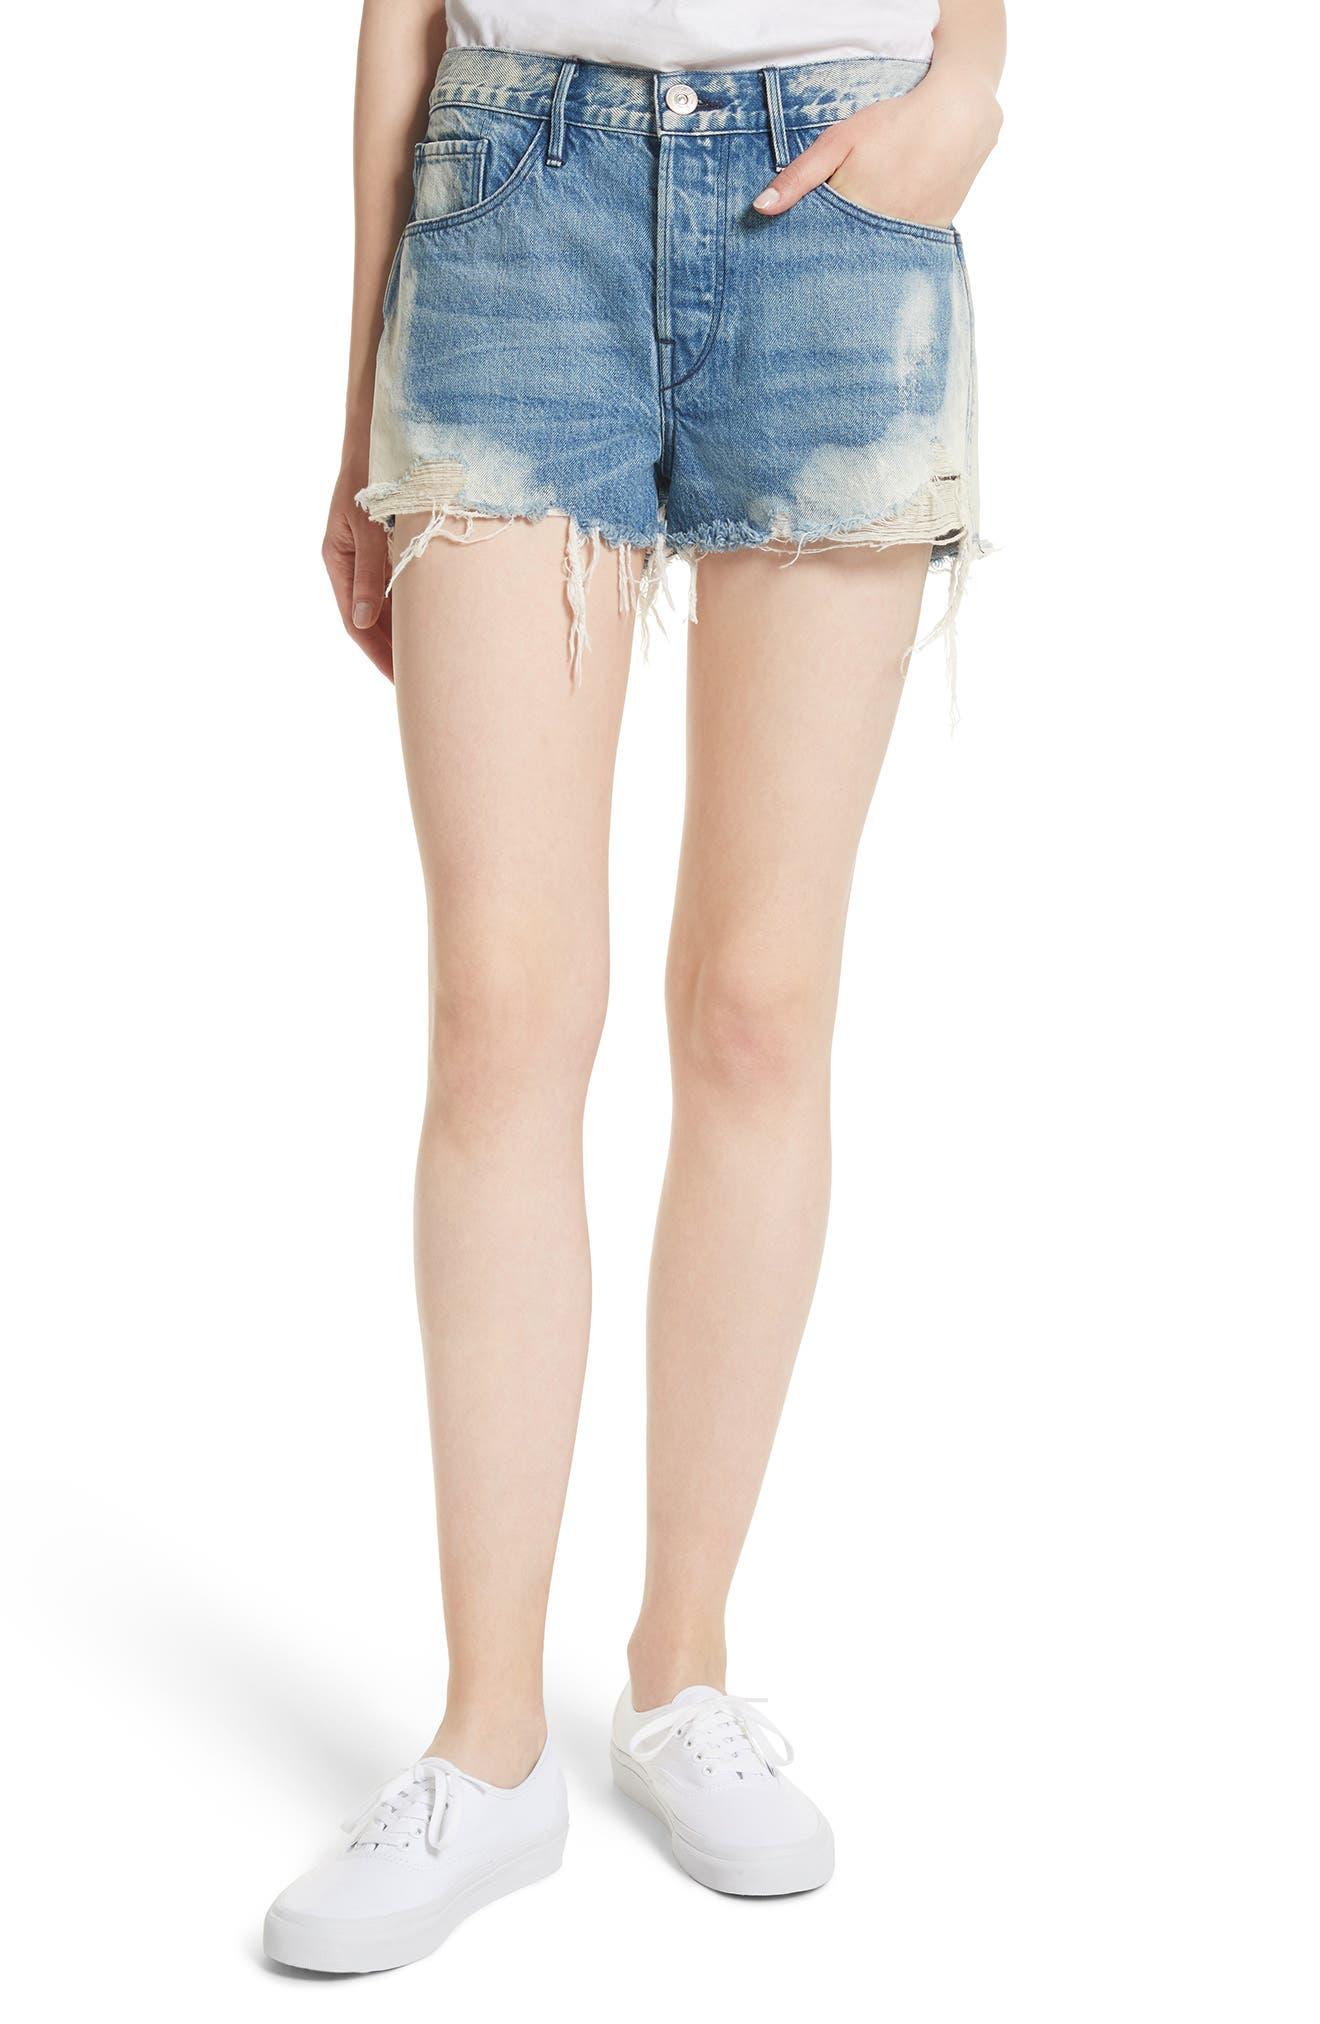 Alternate Image 1 Selected - 3x1 NYC W2 Mason Denim Shorts (Vandal)